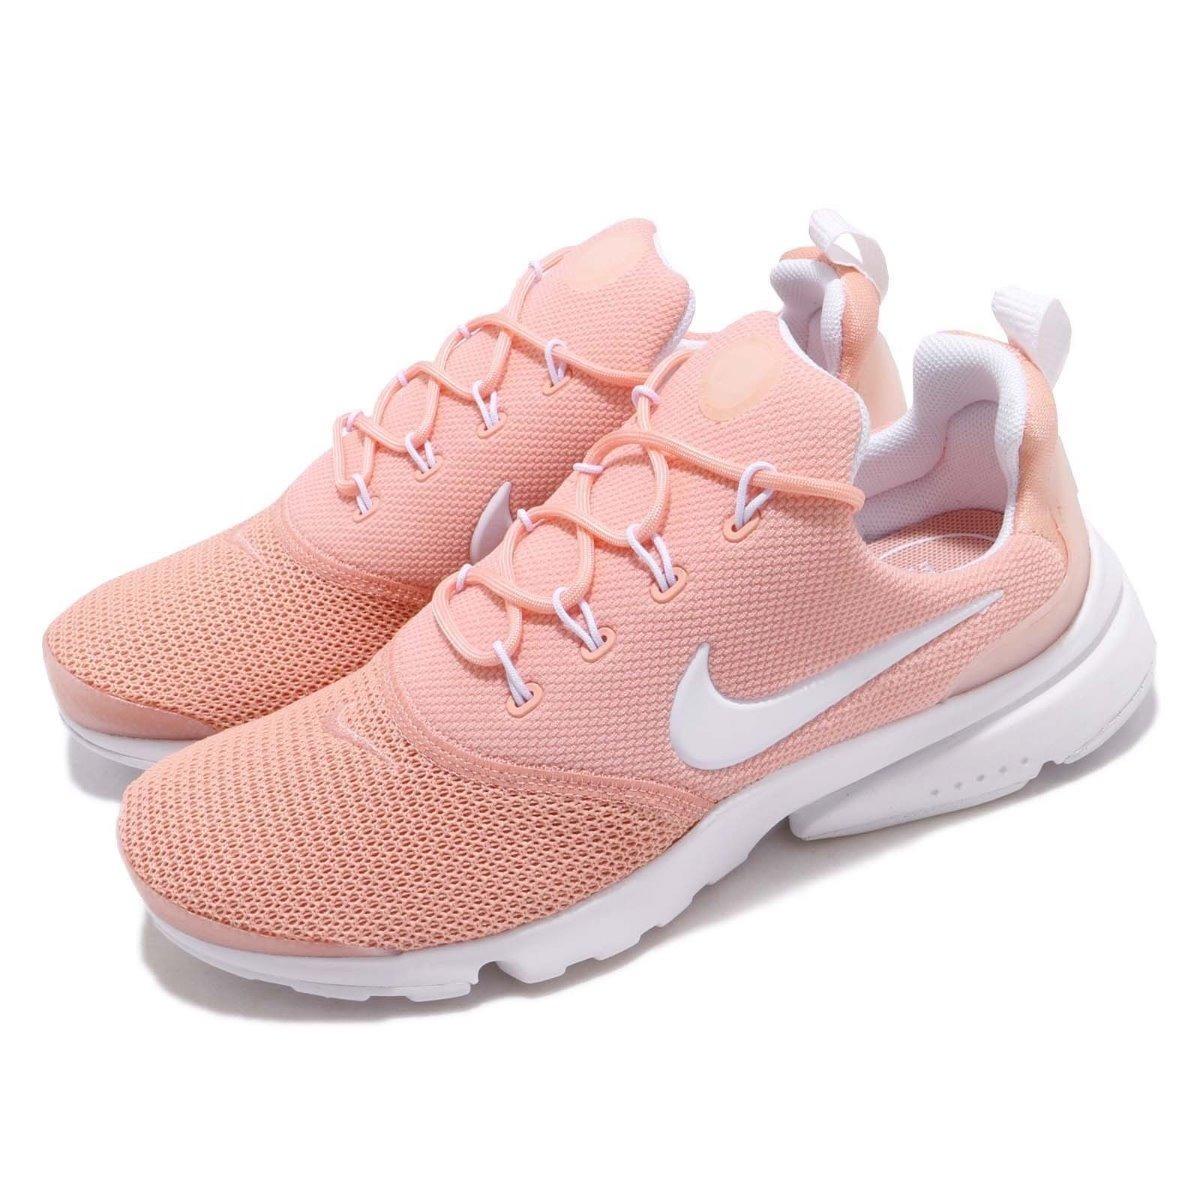 nike free run coral rosado